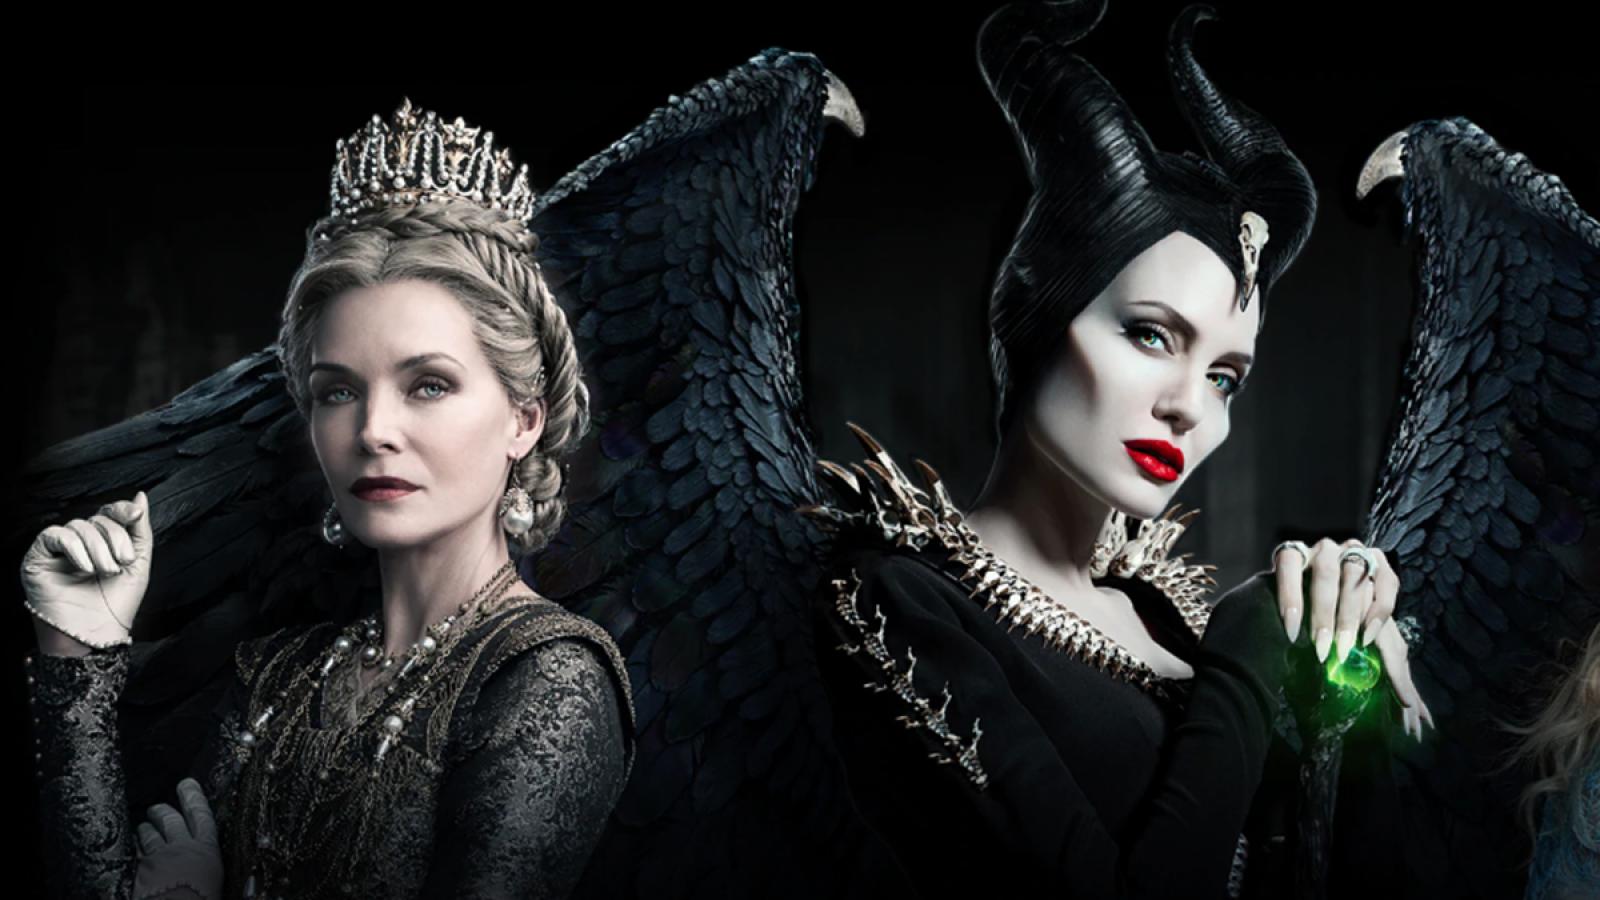 Maleficent 2 Release Date Cast Trailer Runtime